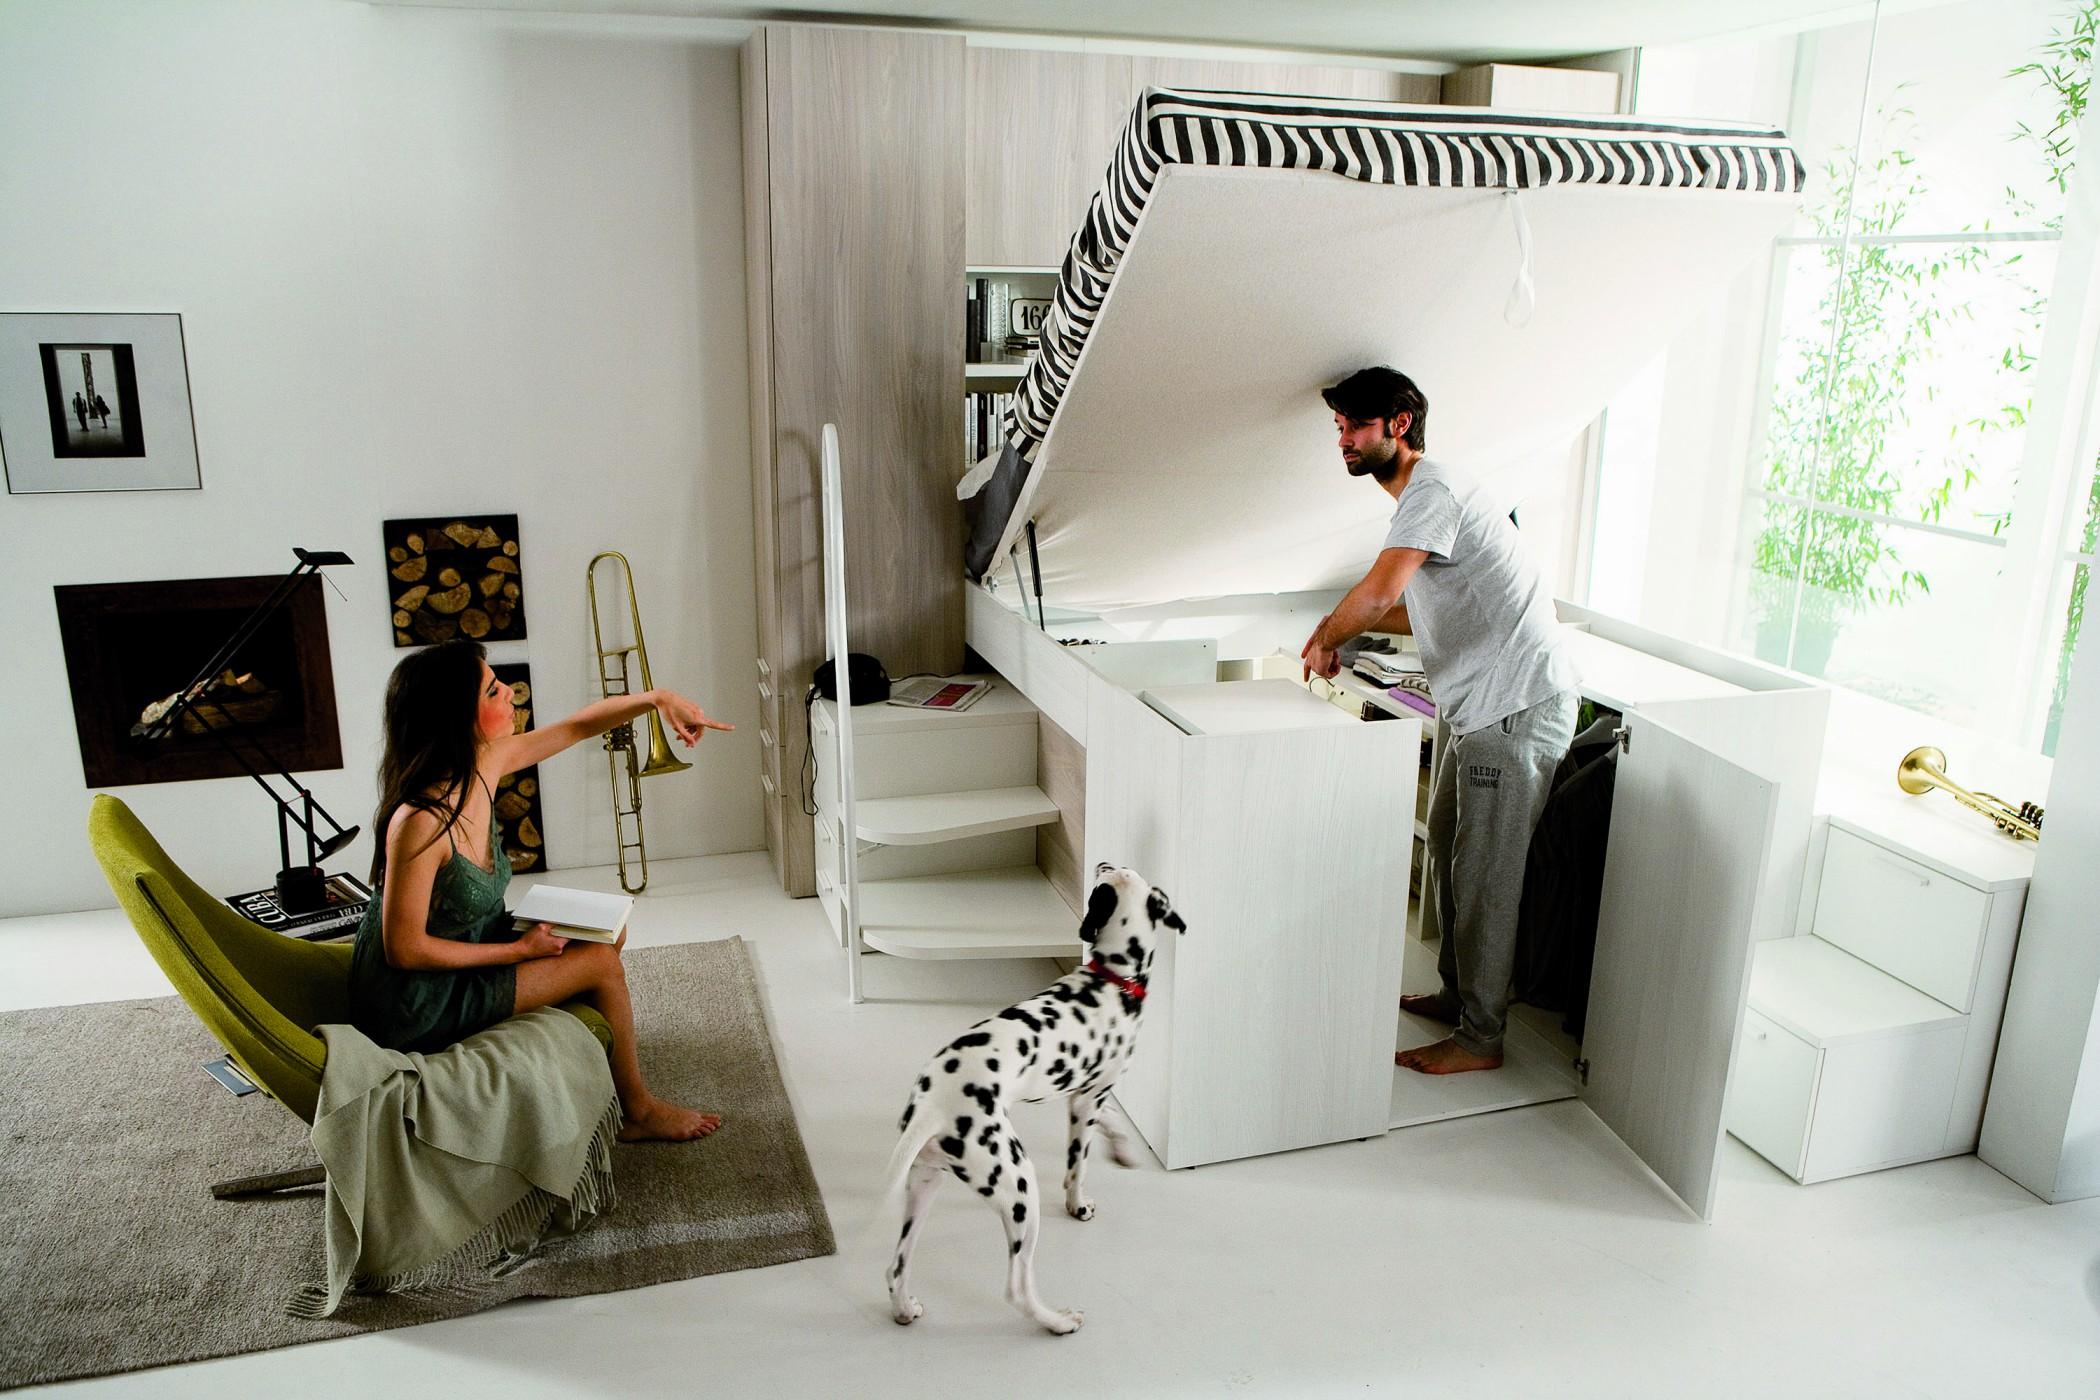 dielle modus: a bed, a project - doimo